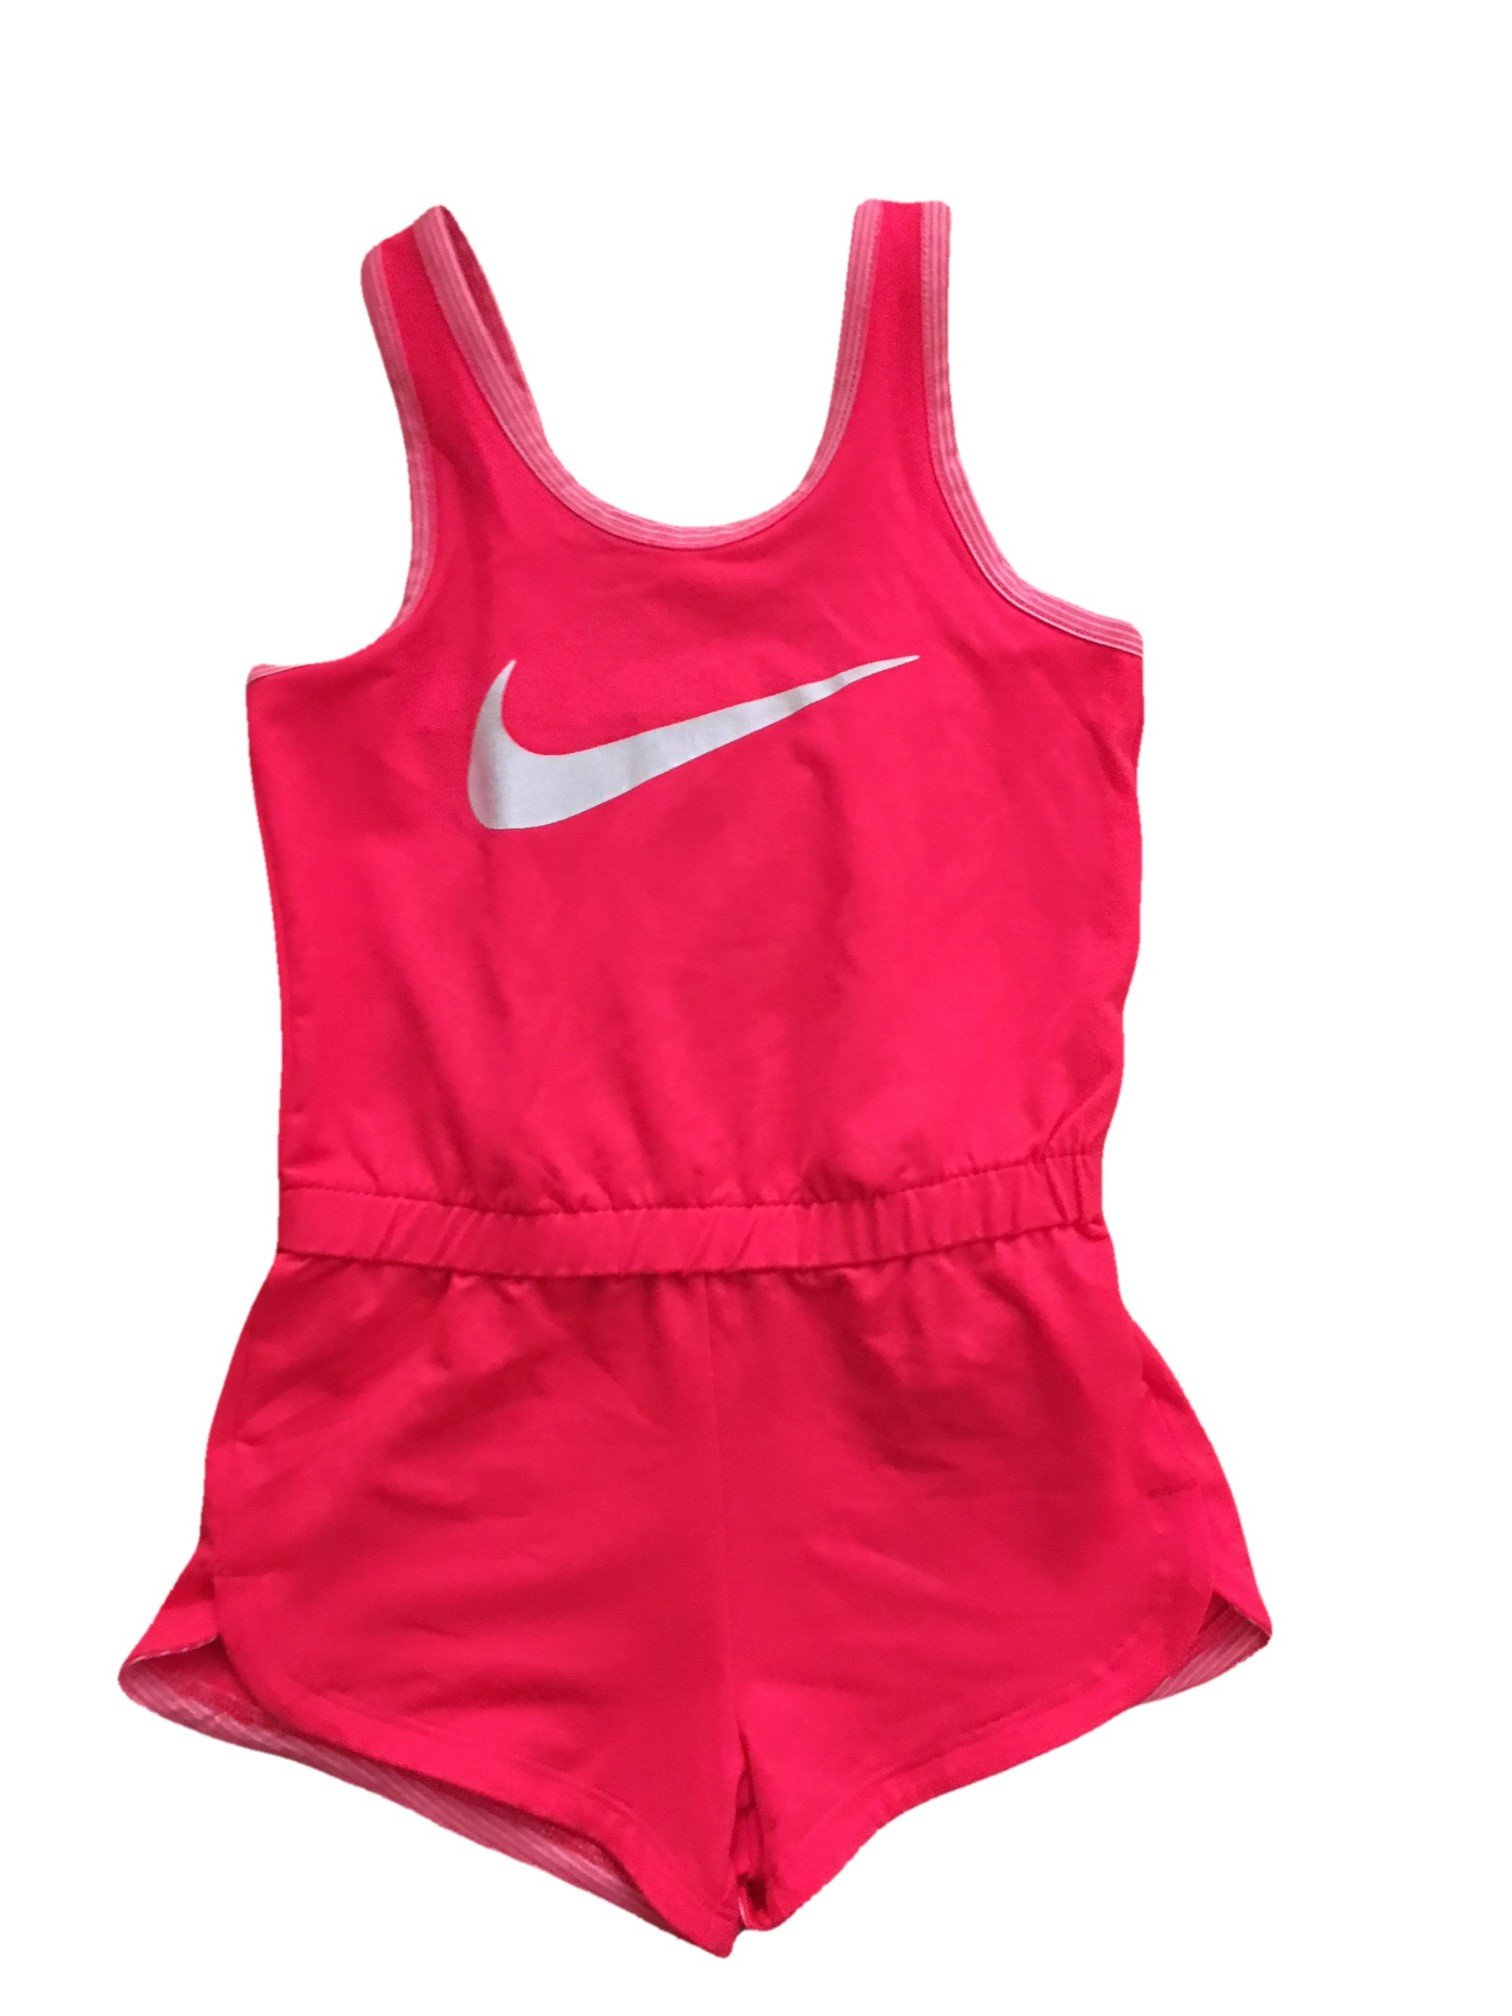 NIKE Infant Toddler Girls Dri-Fit Sports Romper Dark (Hot Pink, 2T)